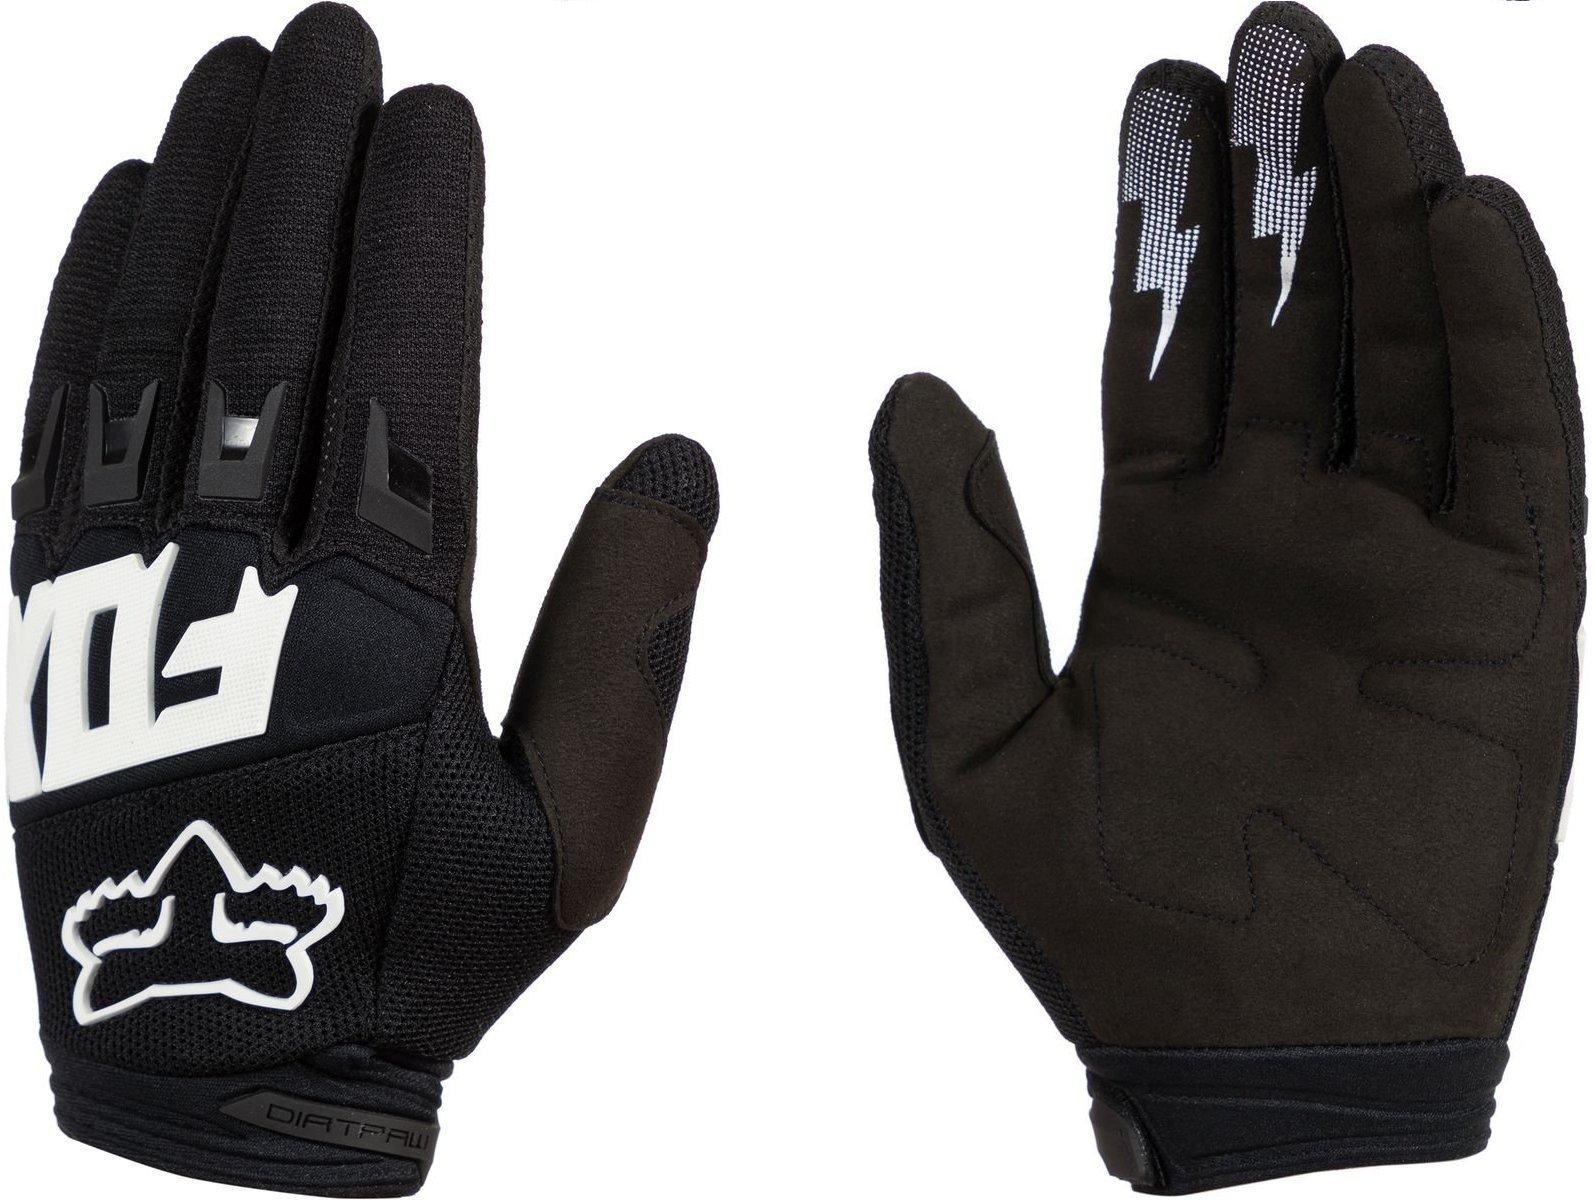 2019 Fox Racing Dirtpaw Race Gloves-Black-L by Fox Racing